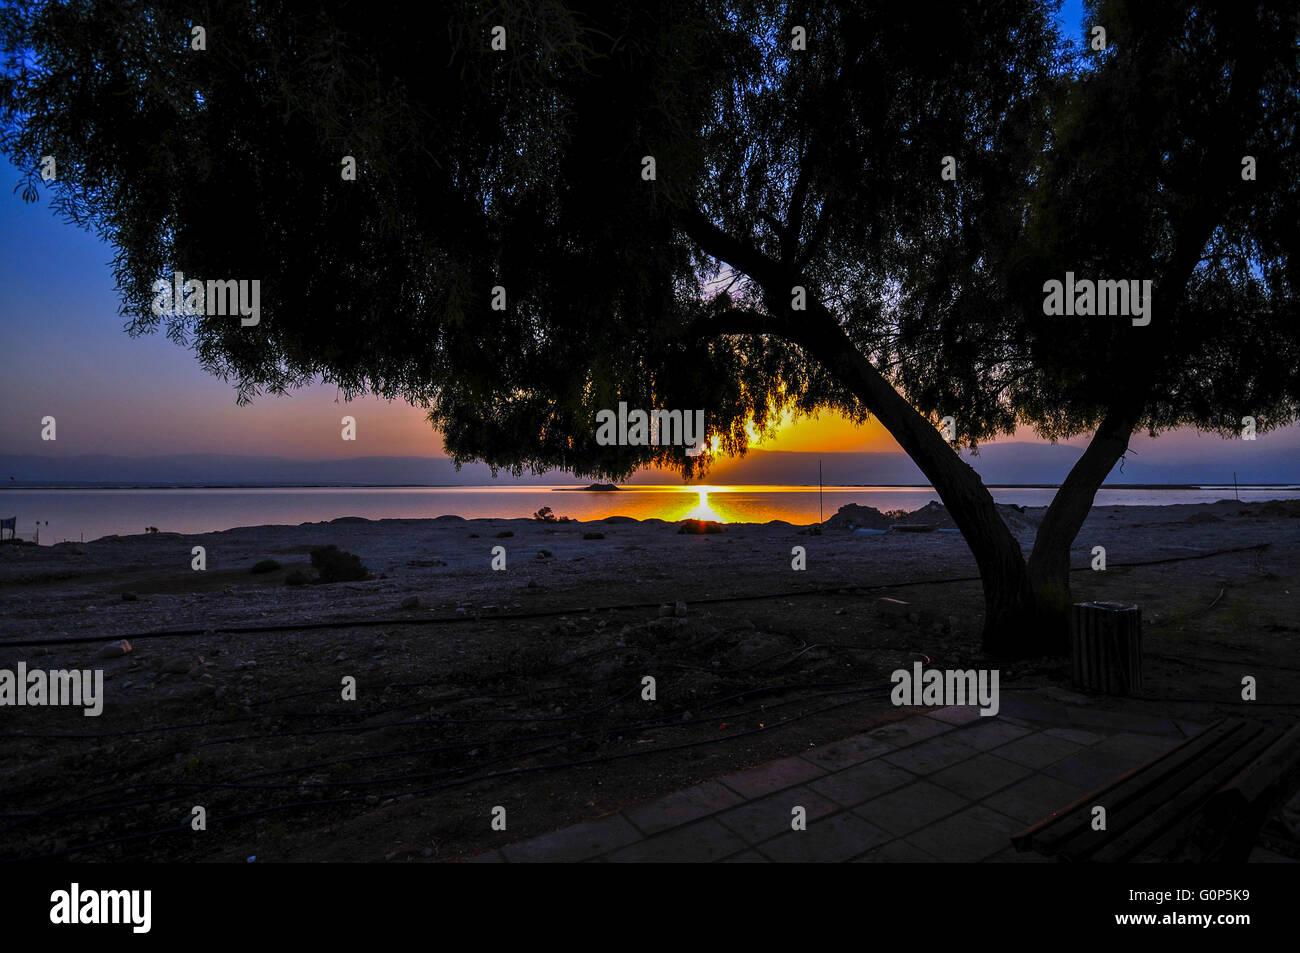 Sun rises over the Dead Sea, Israel - Stock Image